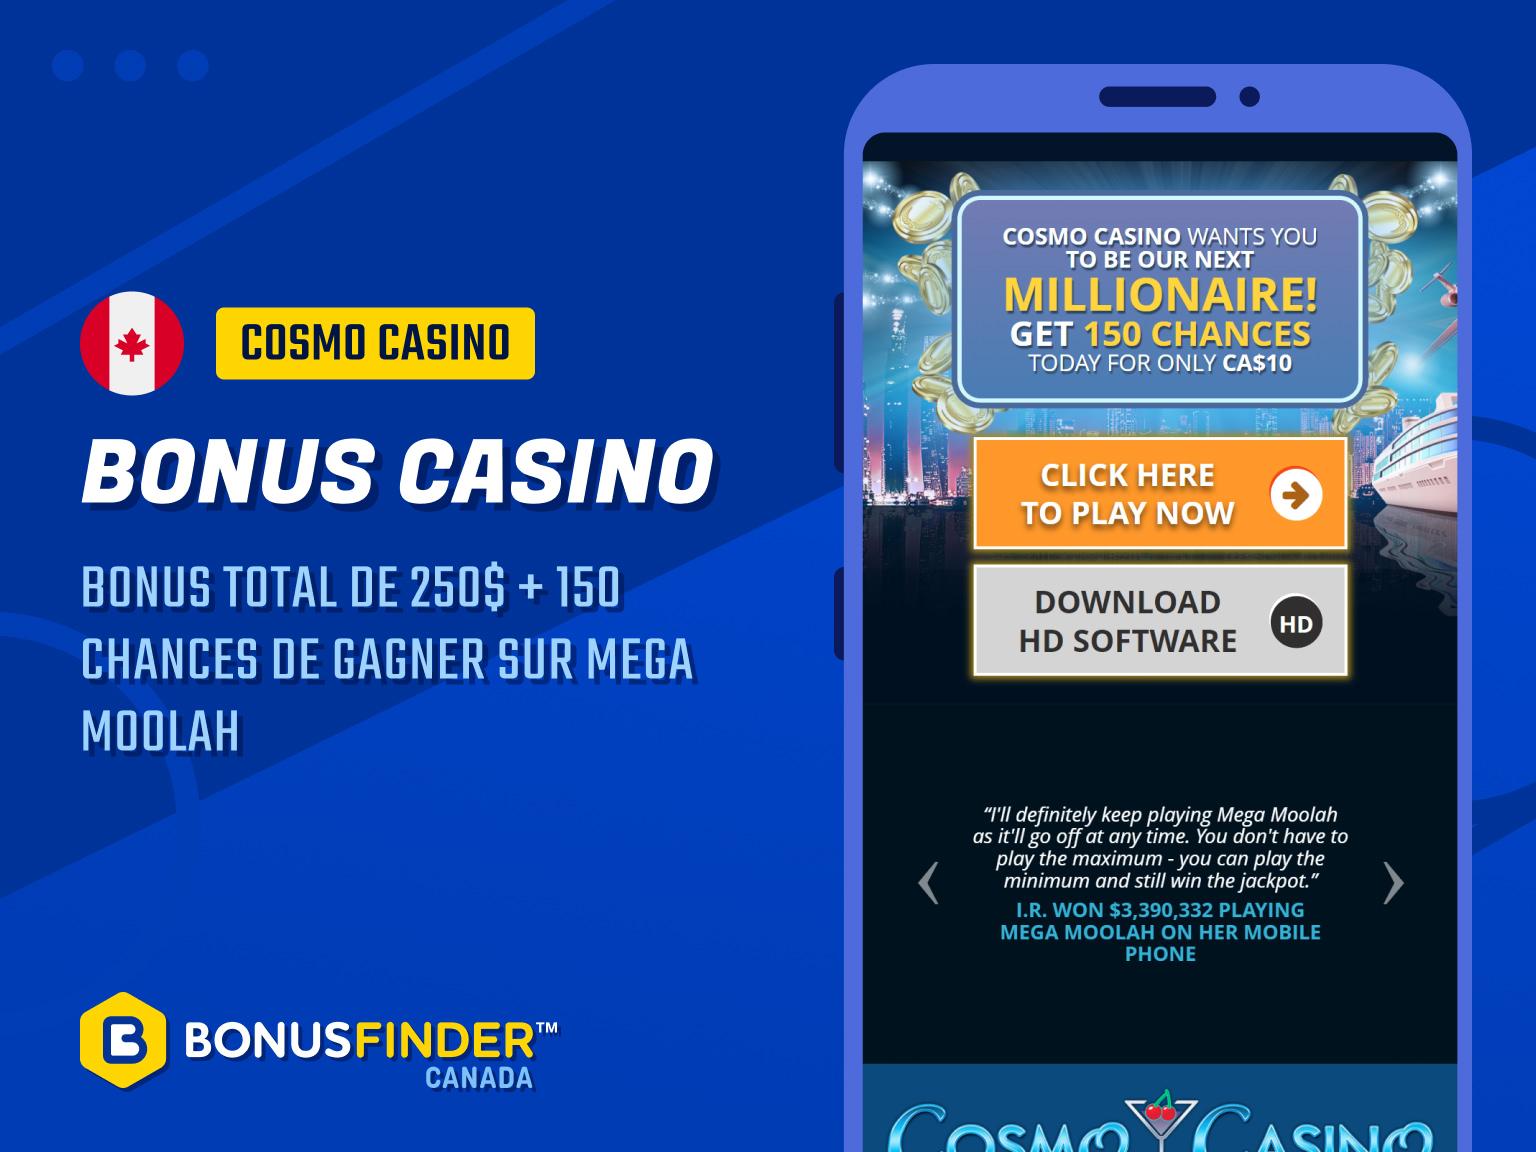 cosmo casino rewards